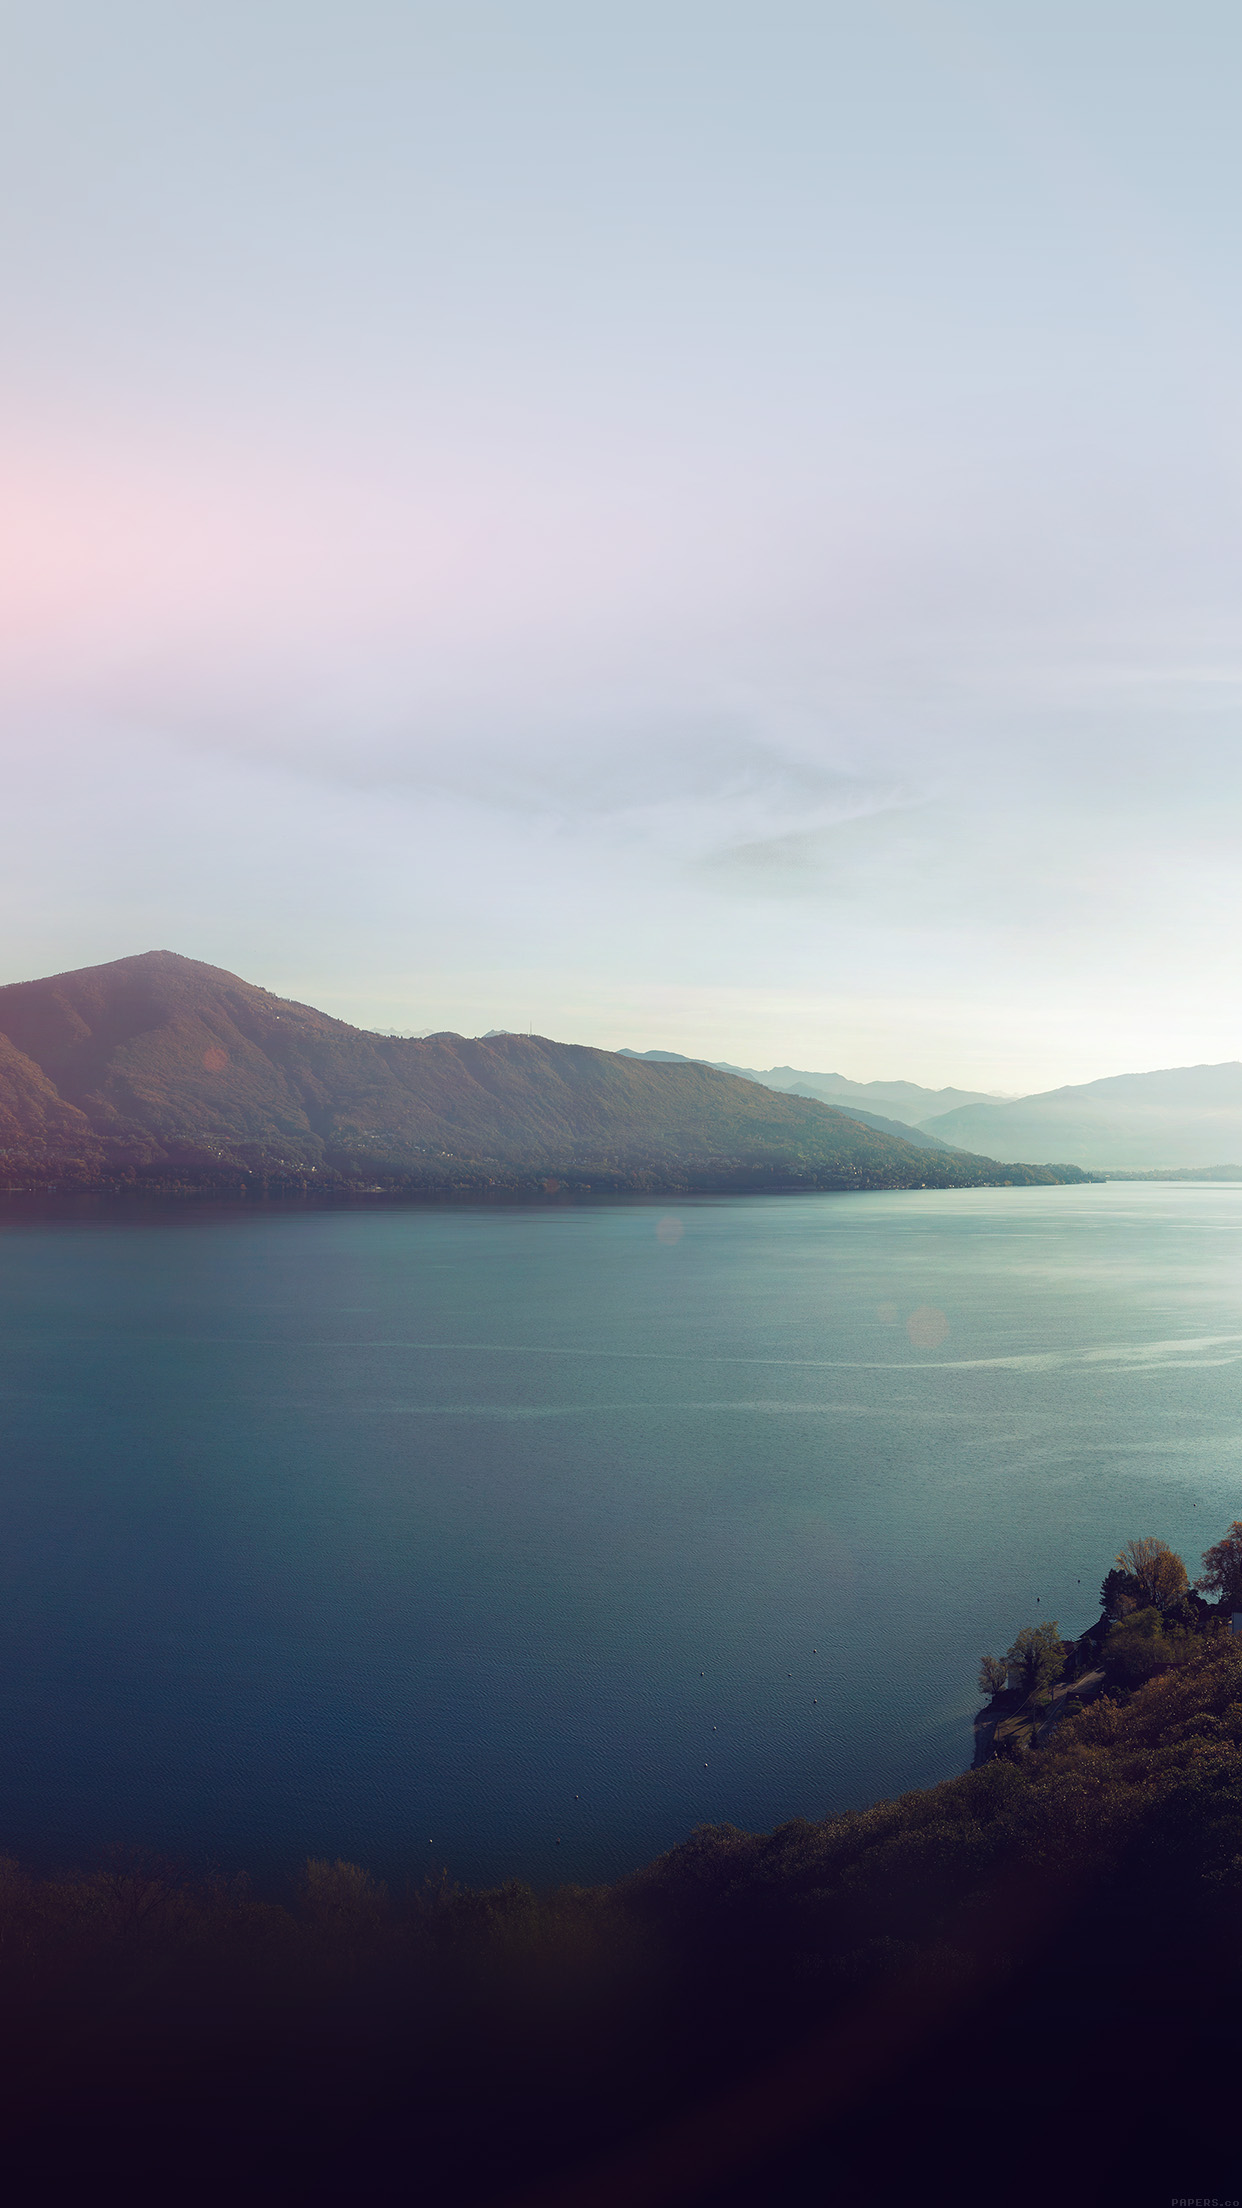 Lake 2016 Pro Apple Macbook Sky